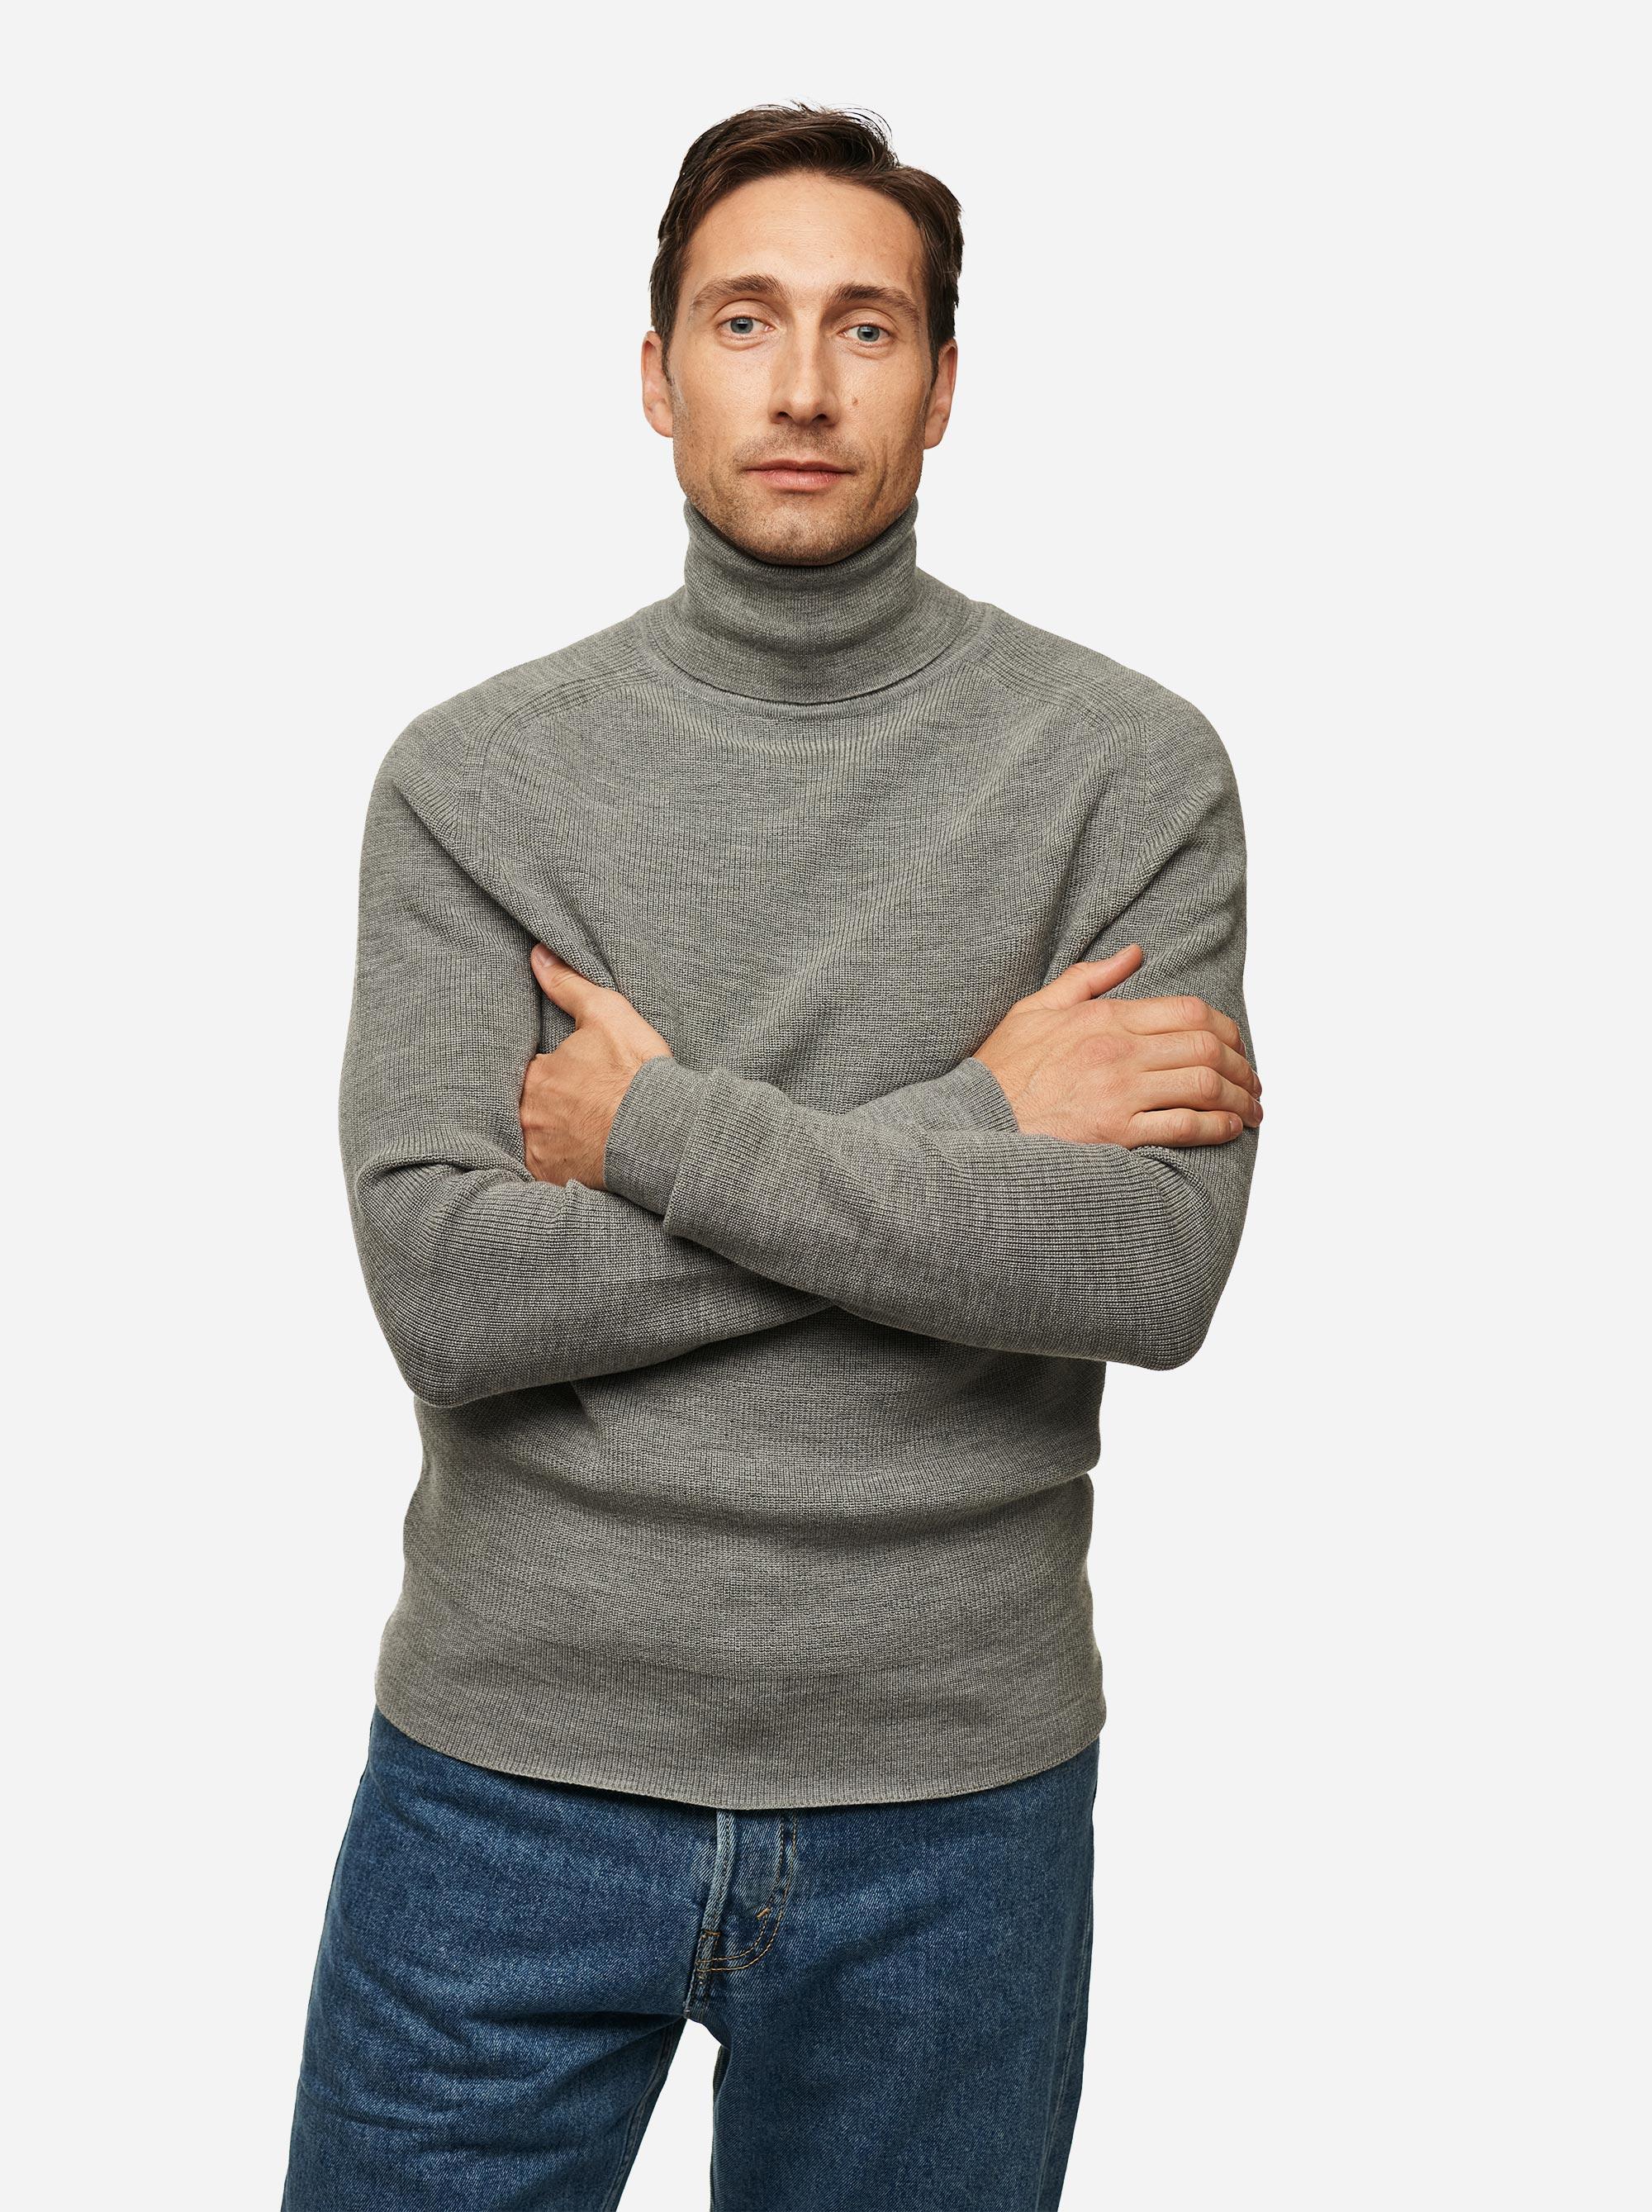 Teym - Turtleneck - The Merino Sweater - Men - Grey - 3